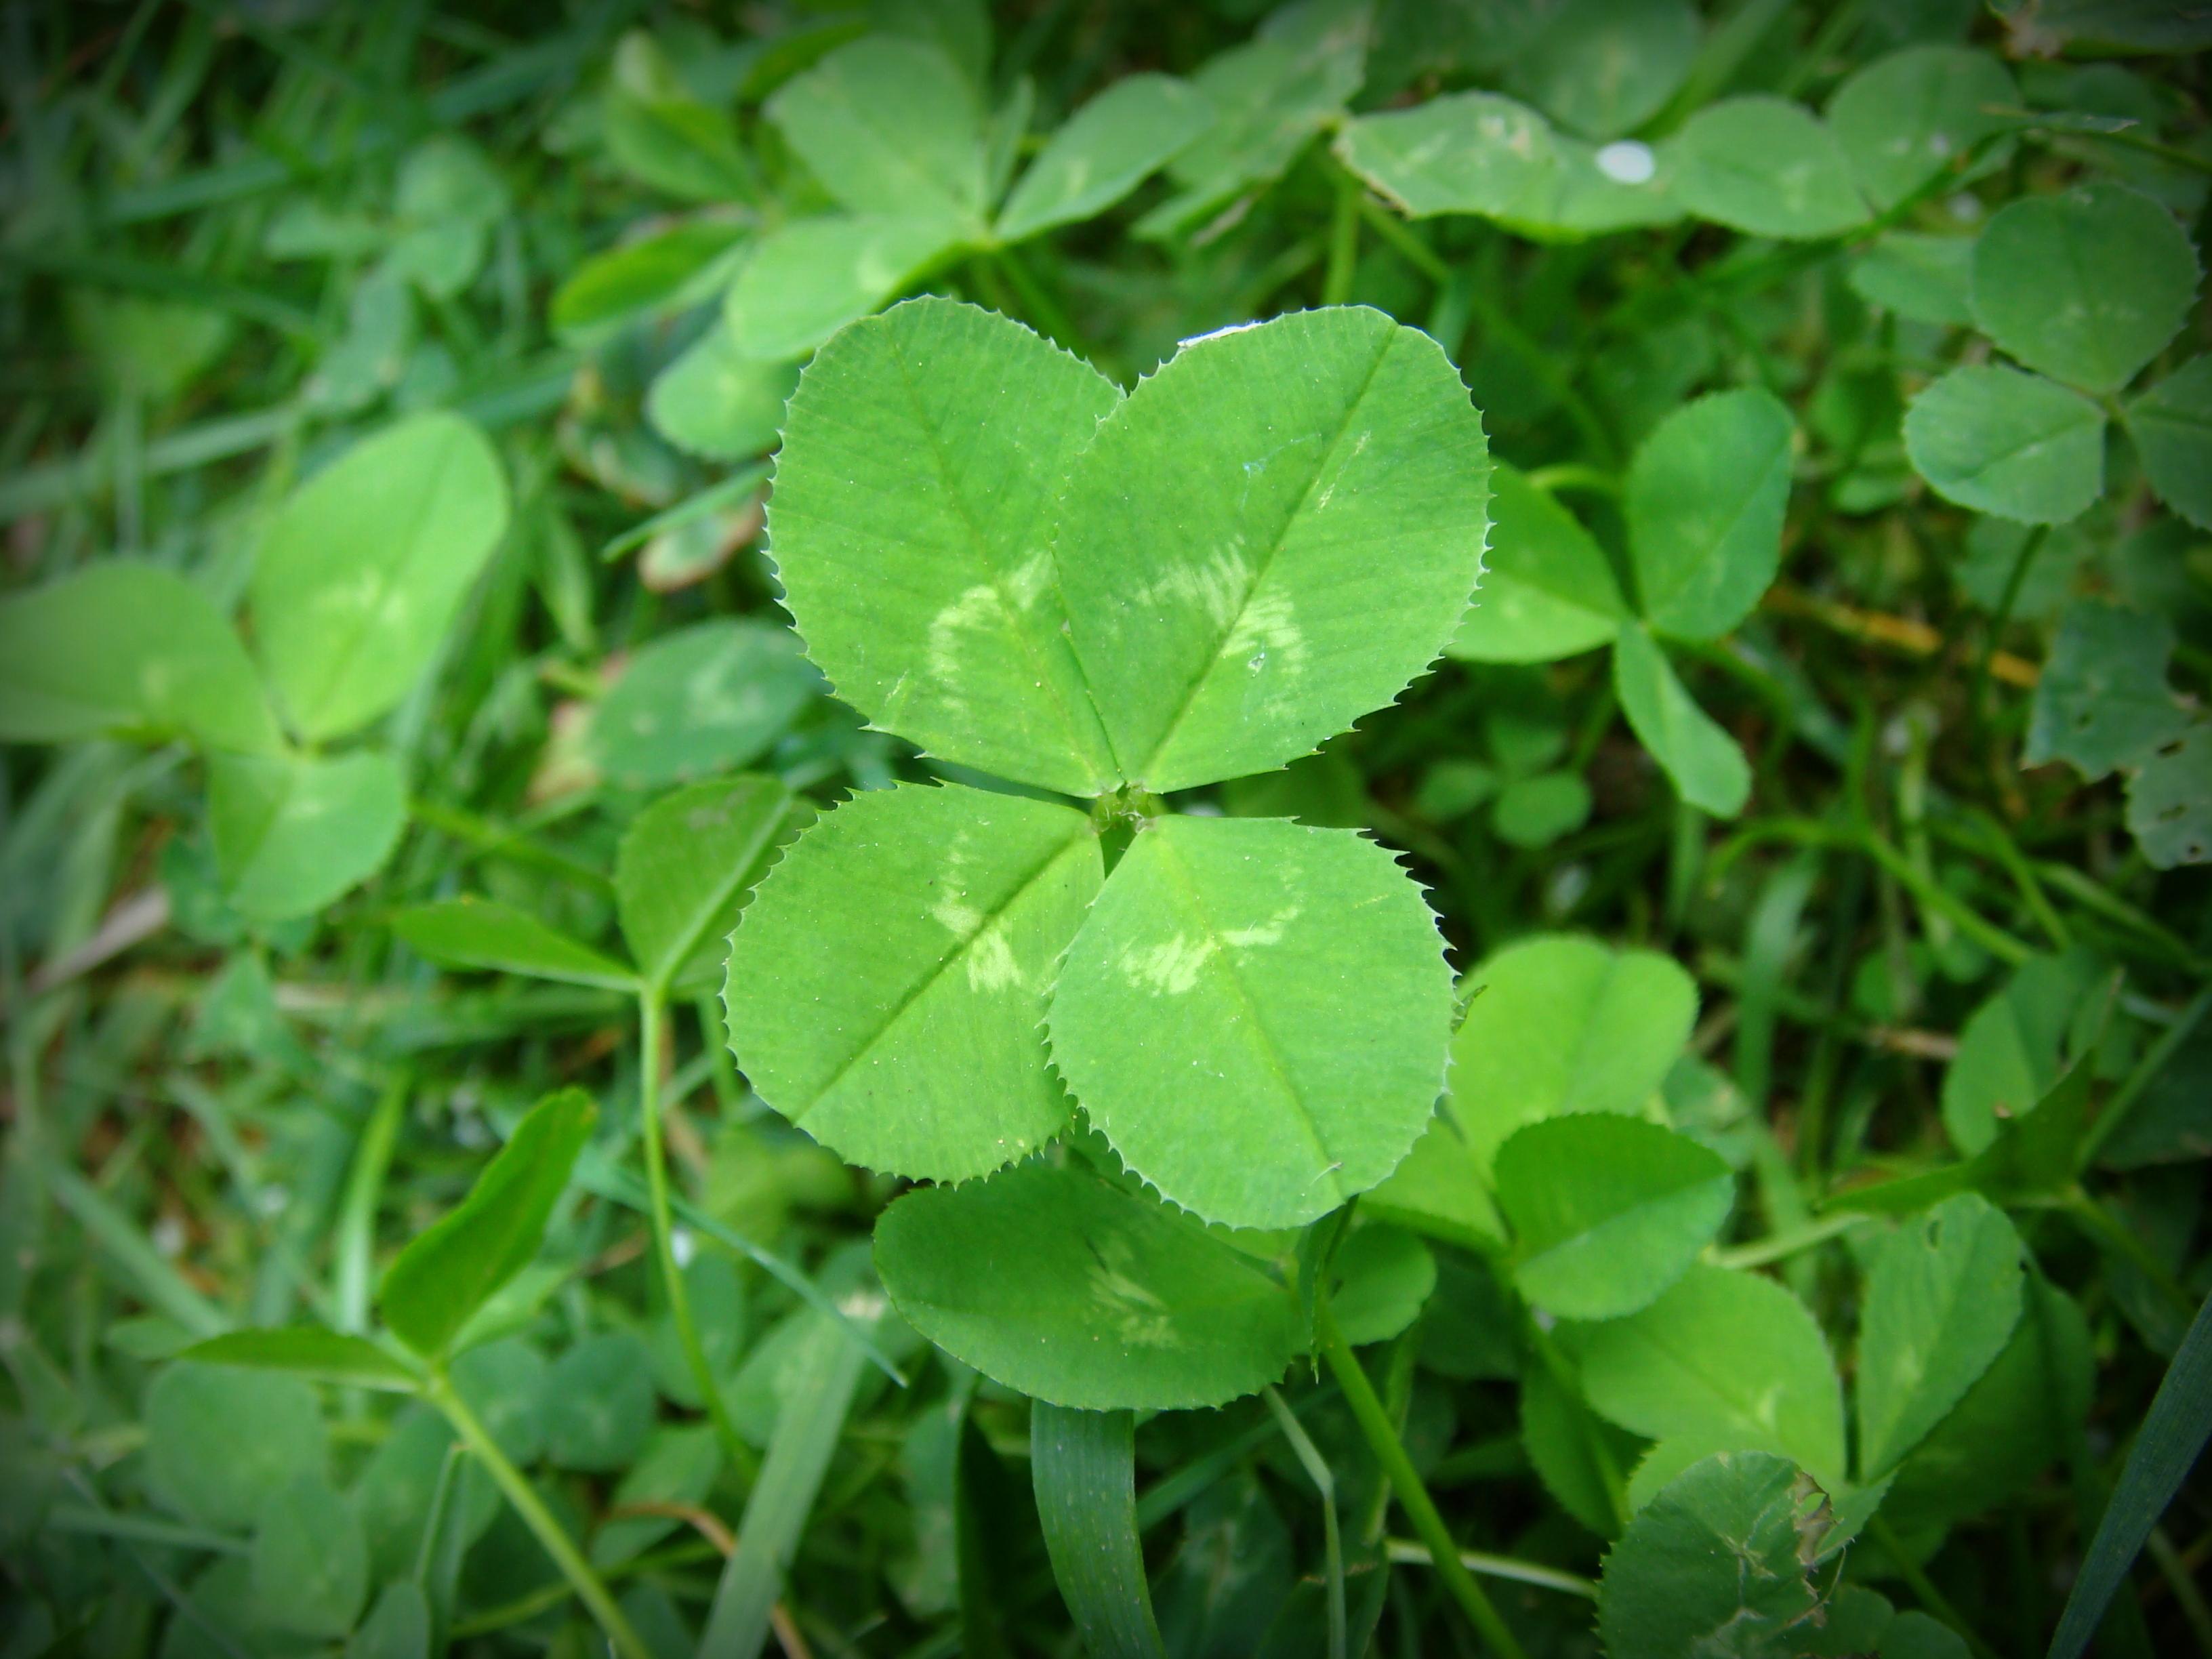 Green three-leaved clovers photo